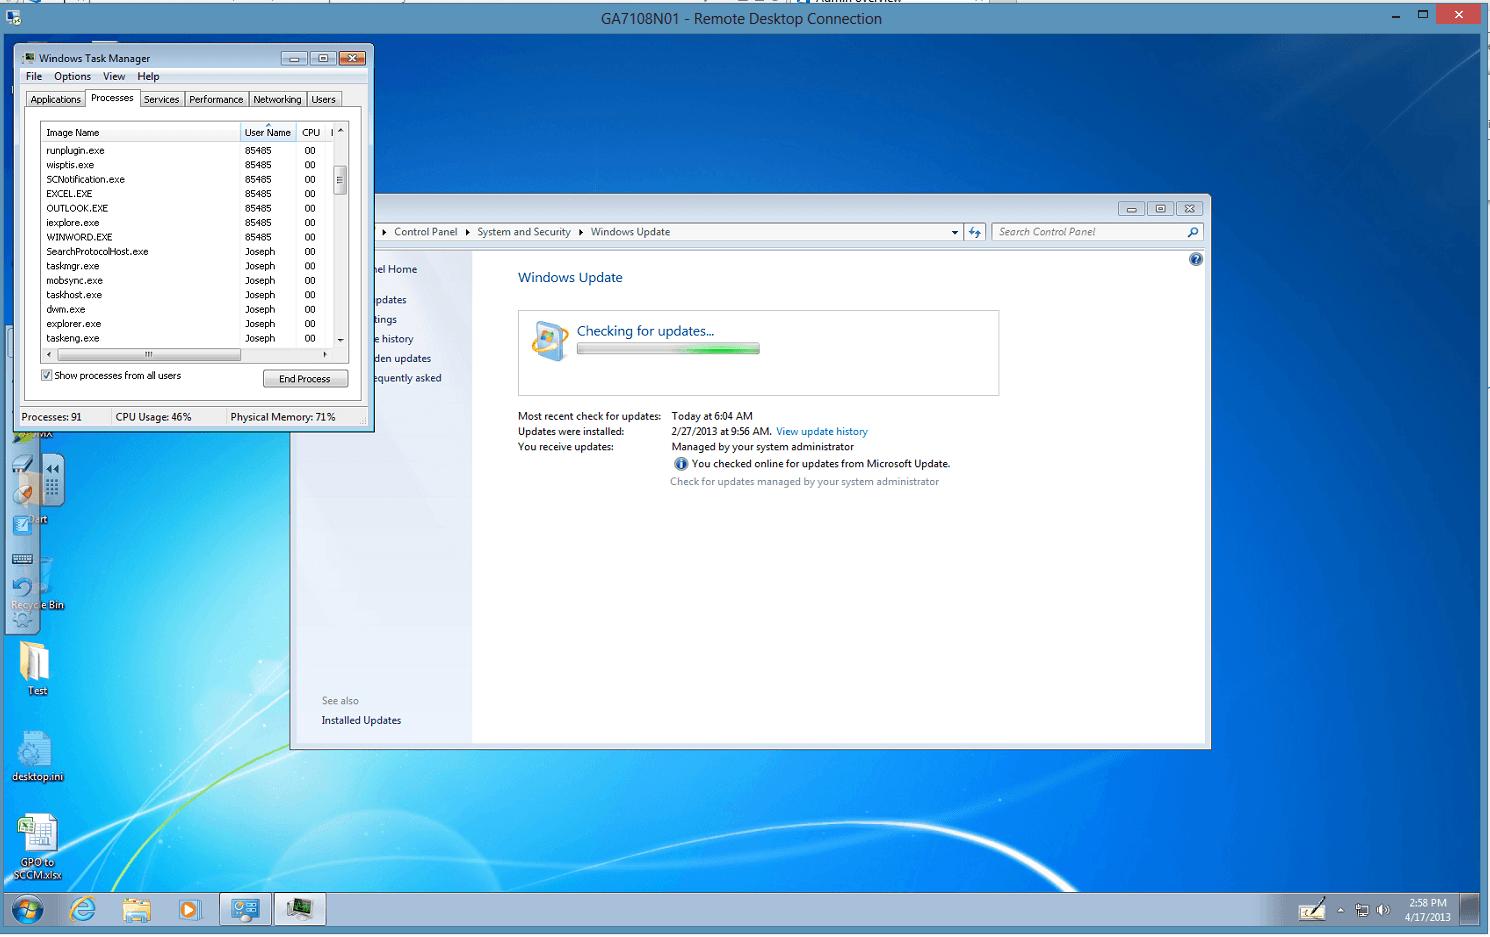 DeployHappiness | Concurrent Remote Desktop (CRDP) for